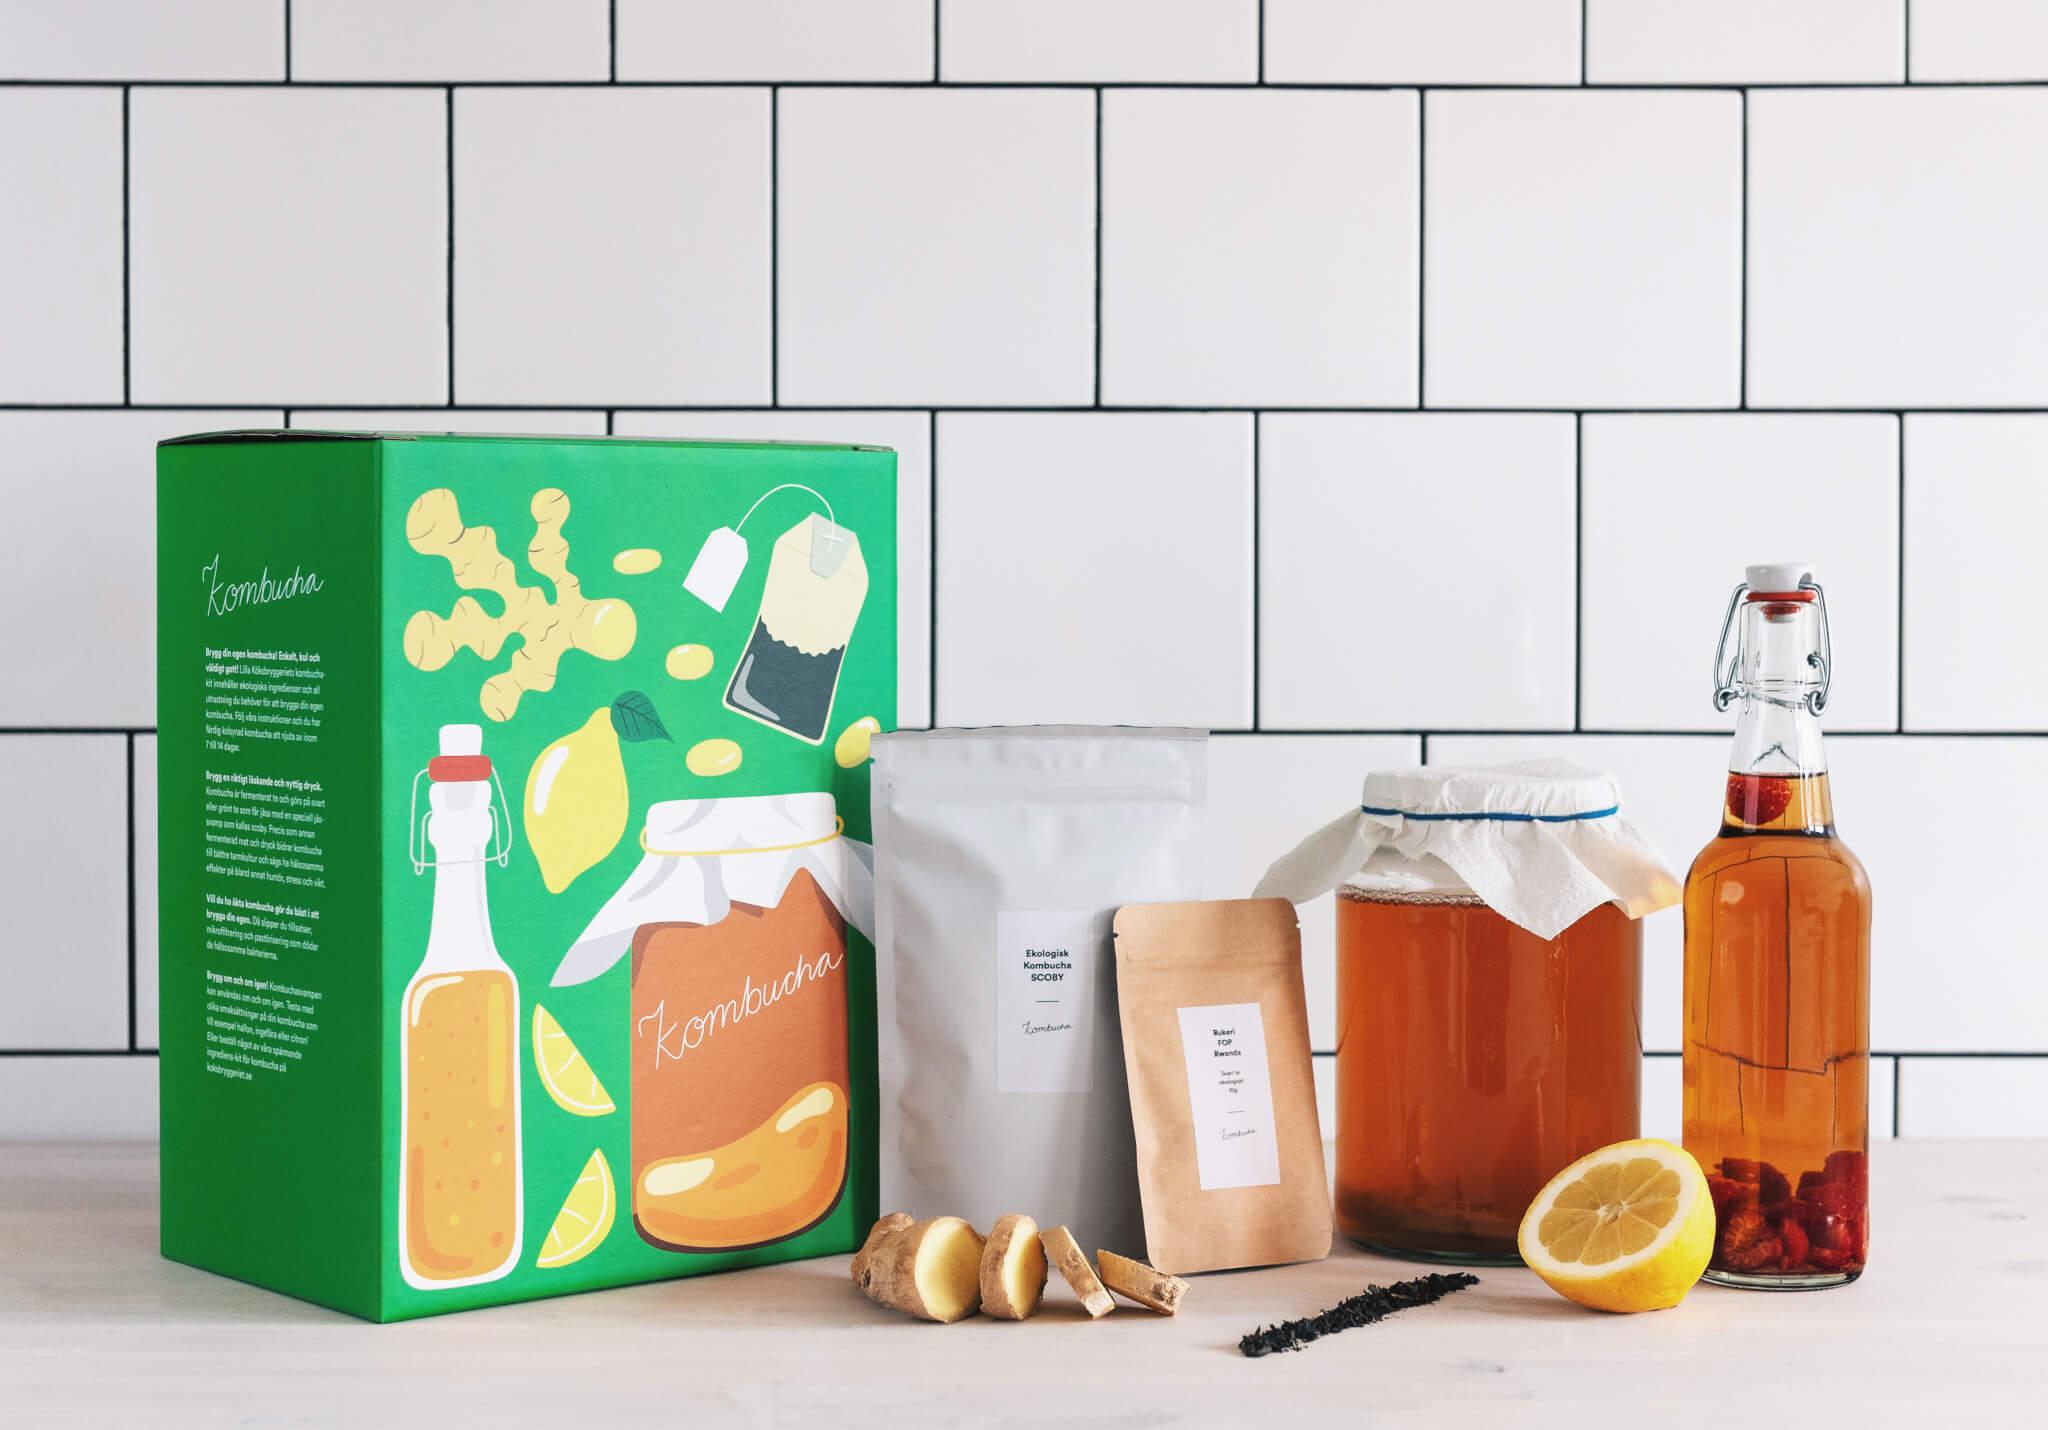 packhelp - packaging of Det Lilla Köksbryggeriet